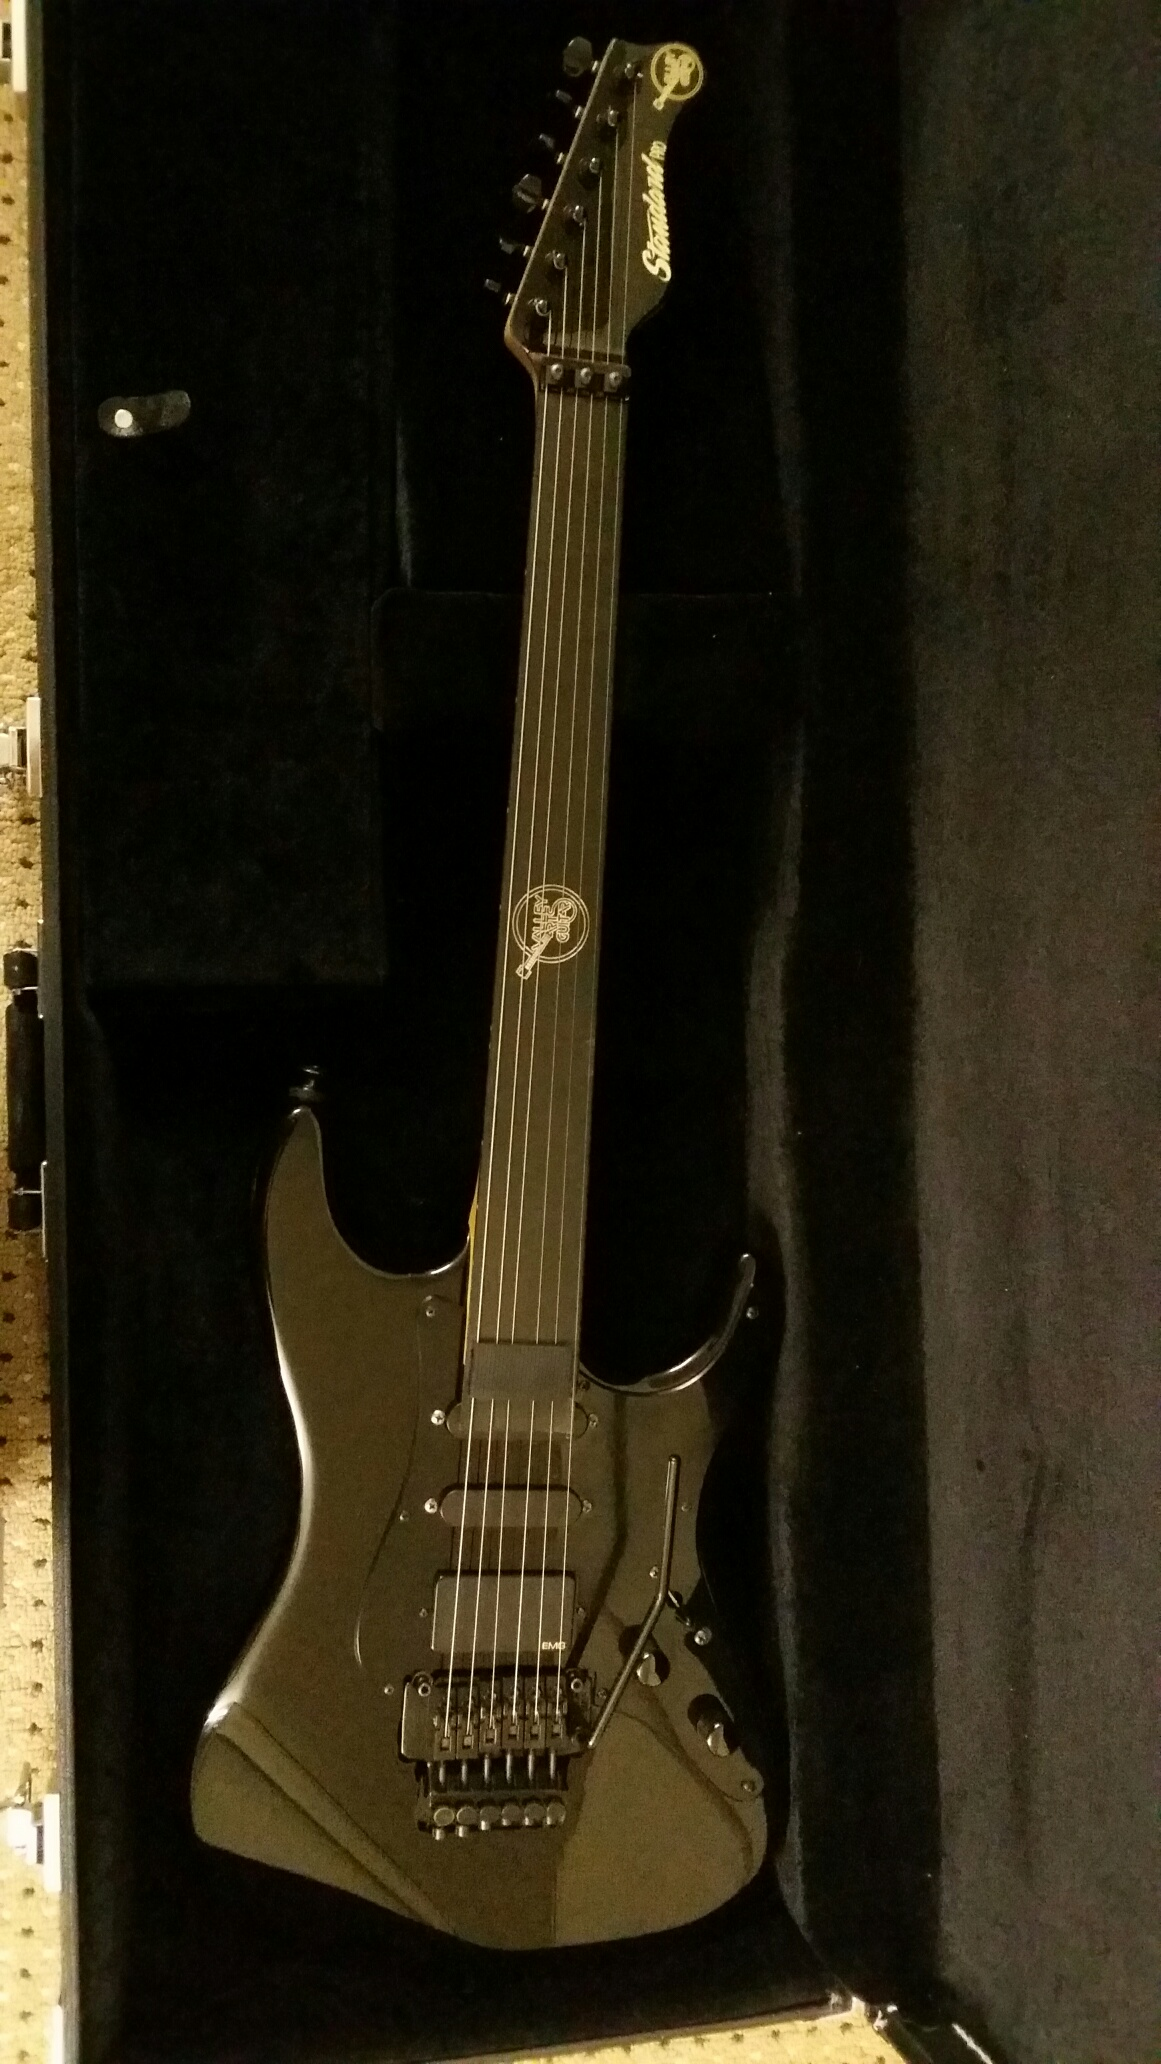 0395 va standard pro new 4 15 17 new owner 8 20 19 valley arts guitars. Black Bedroom Furniture Sets. Home Design Ideas